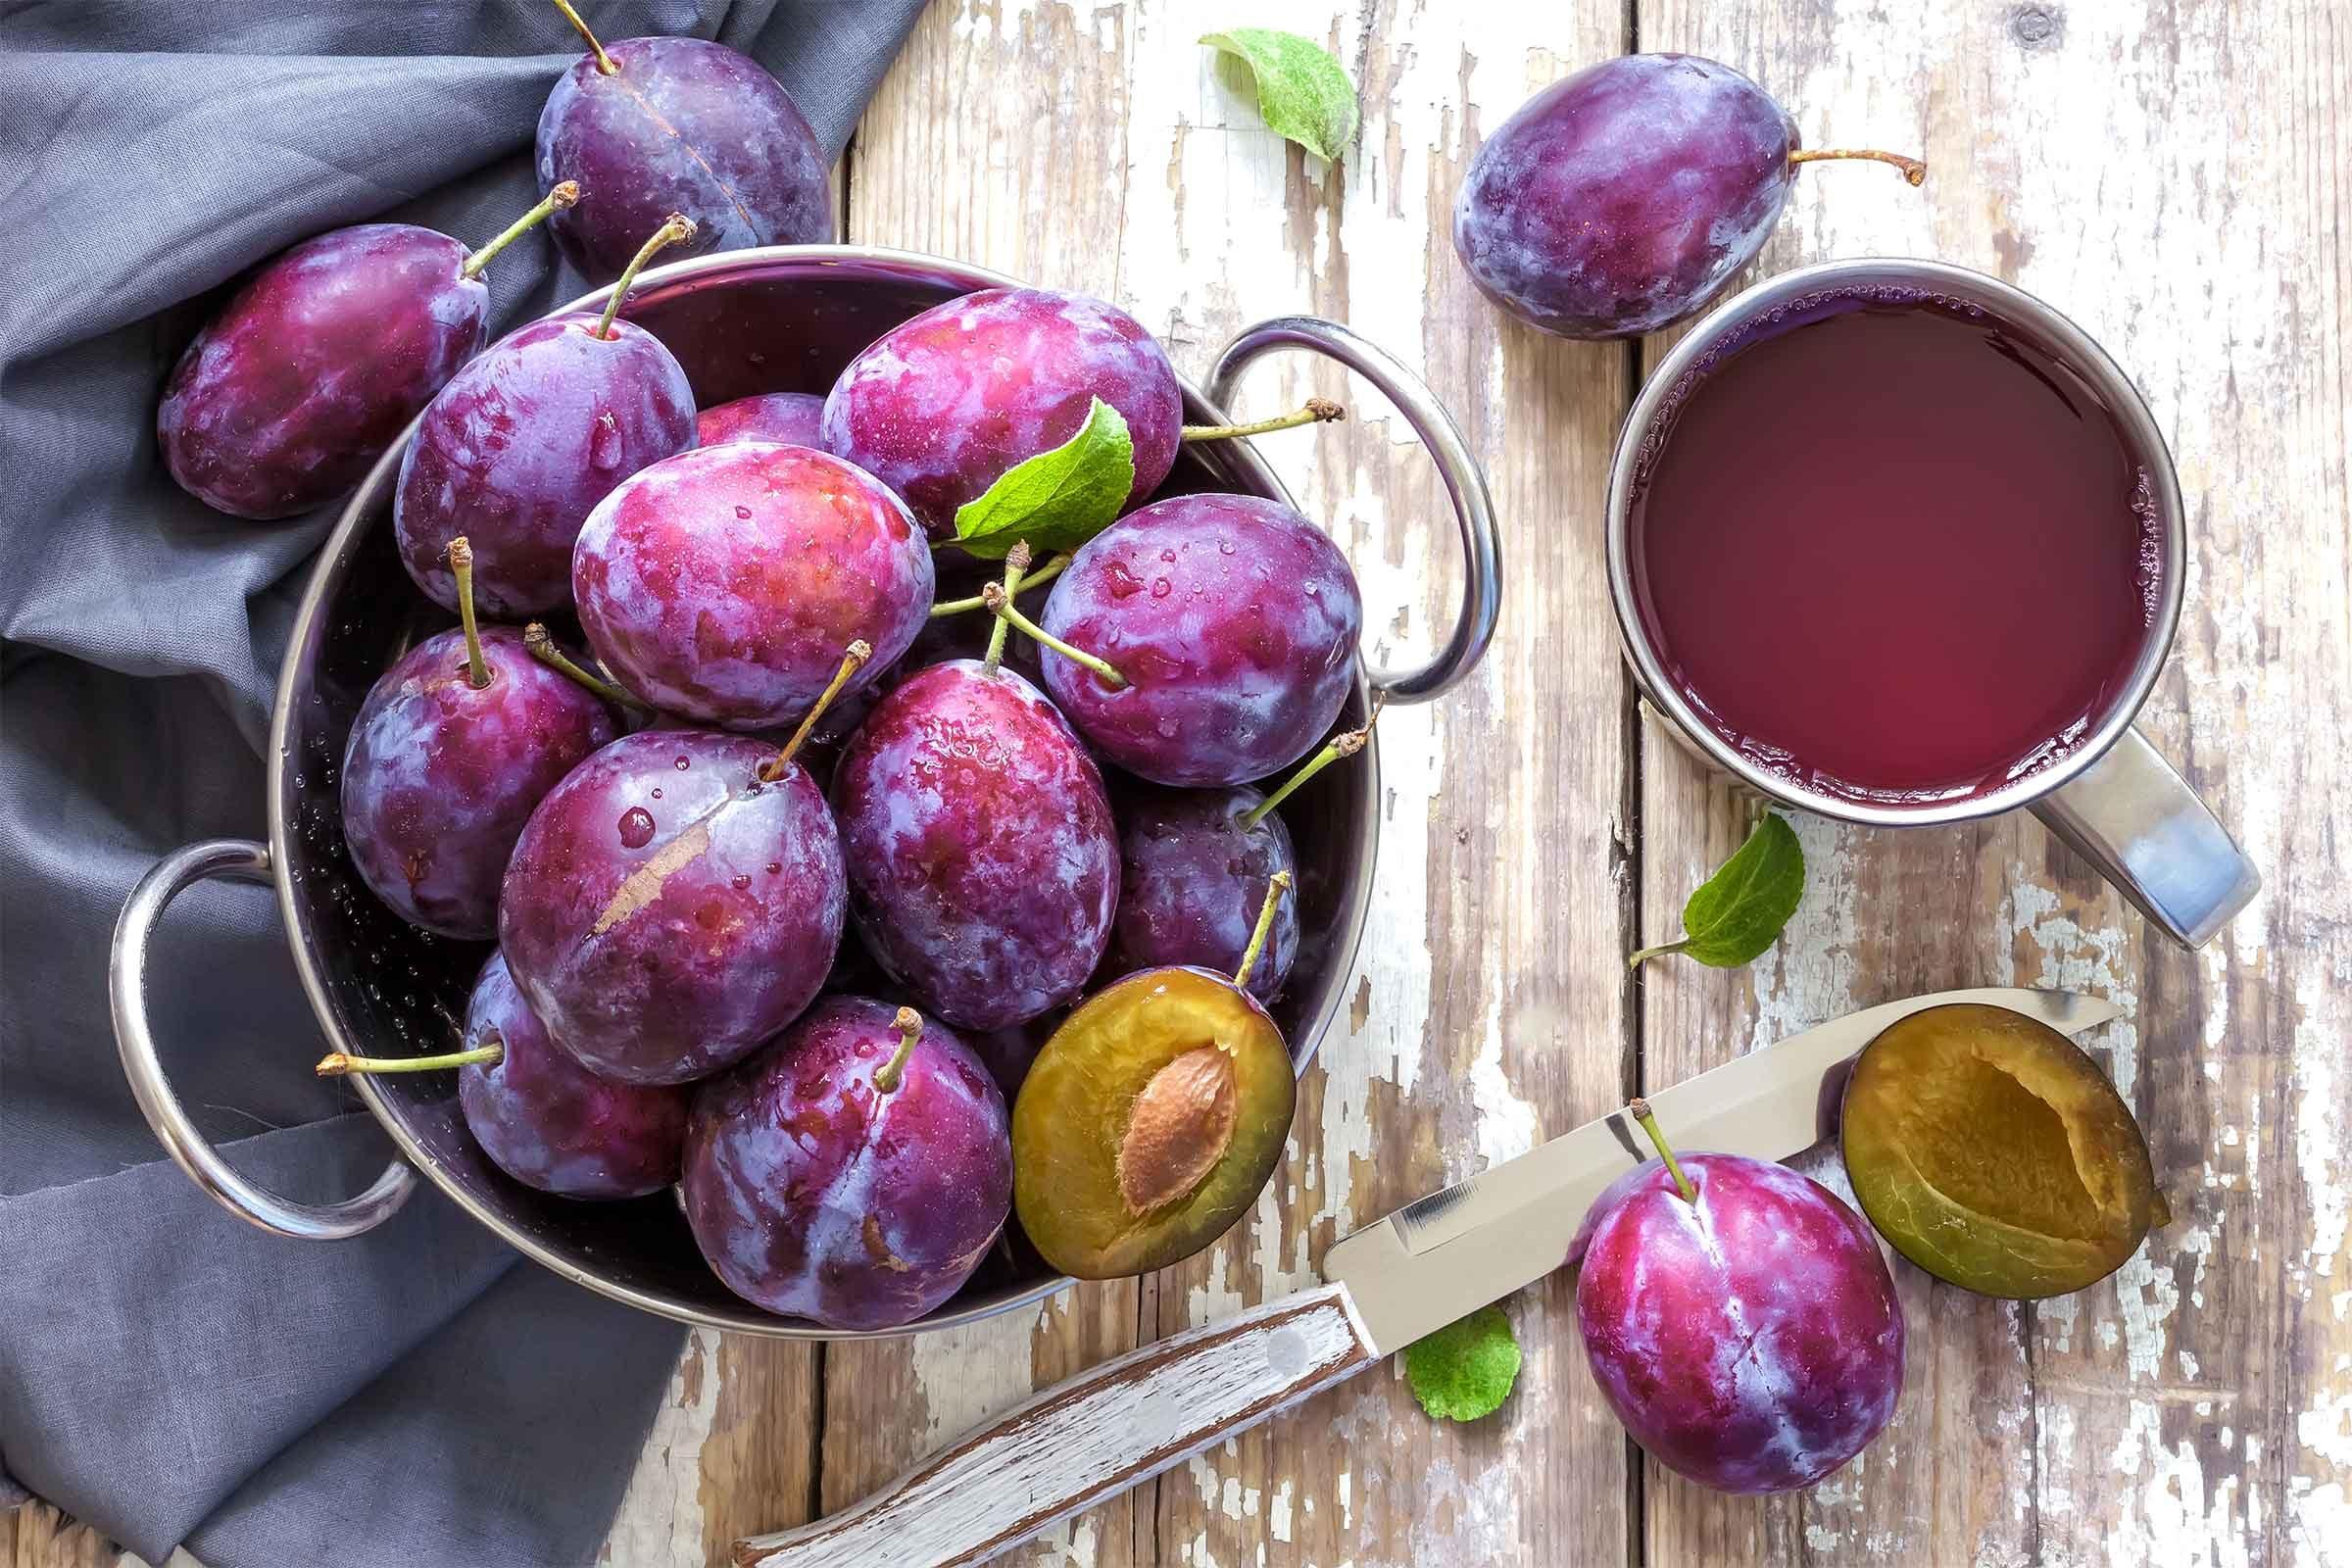 Healthy Juice: Fruit Juices With Health Benefits | Reader ...